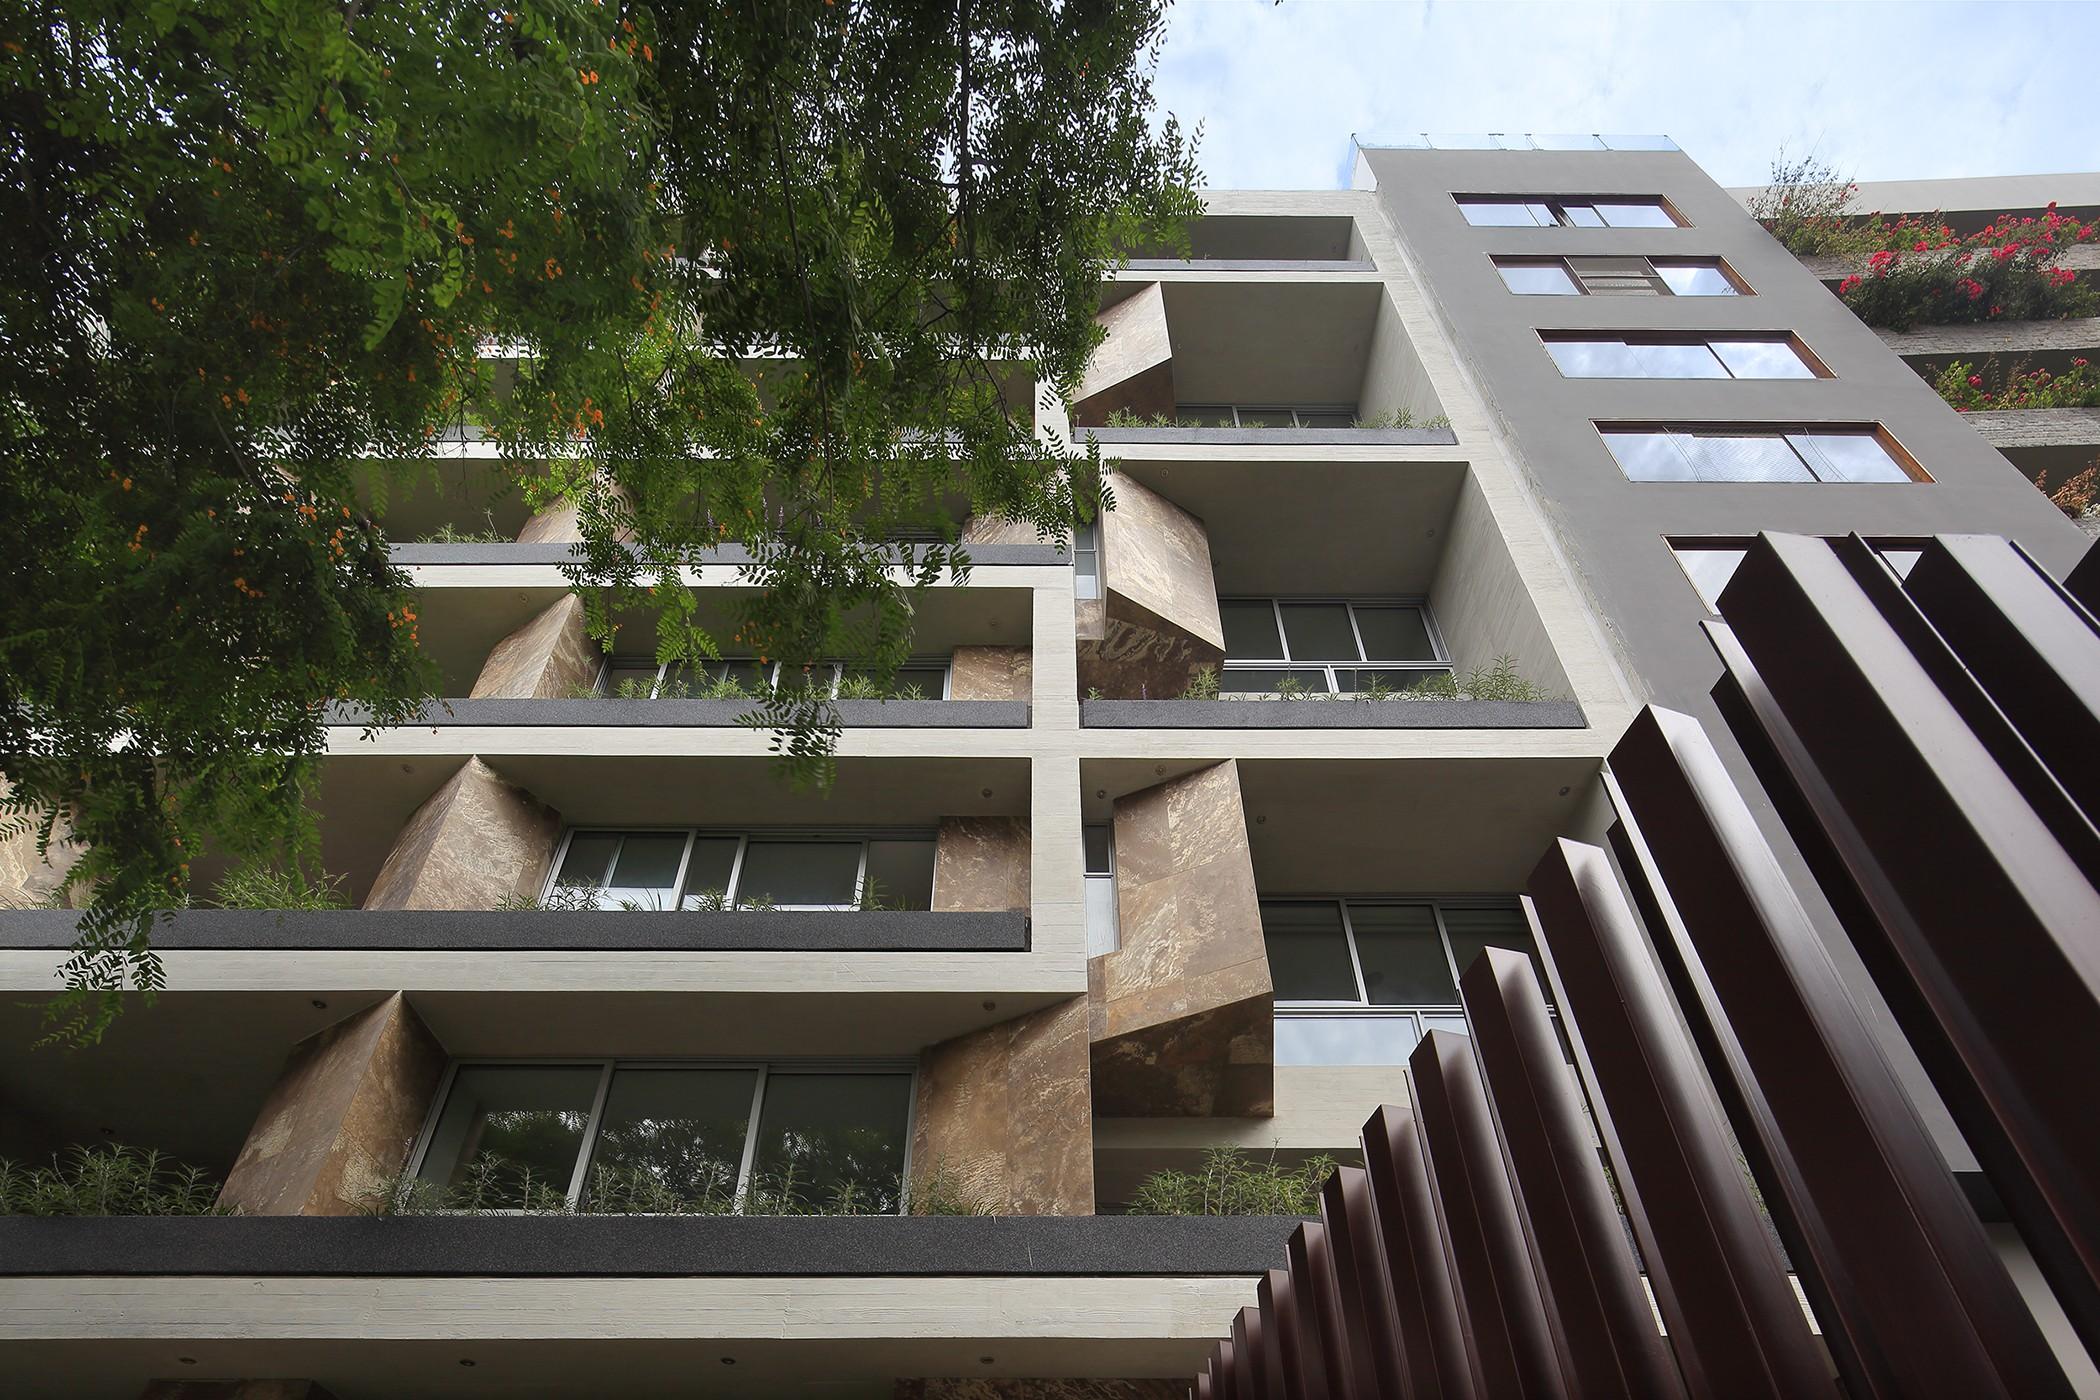 Edificio Multifamiliar Sanctum, San Isidro, Lima, Perú